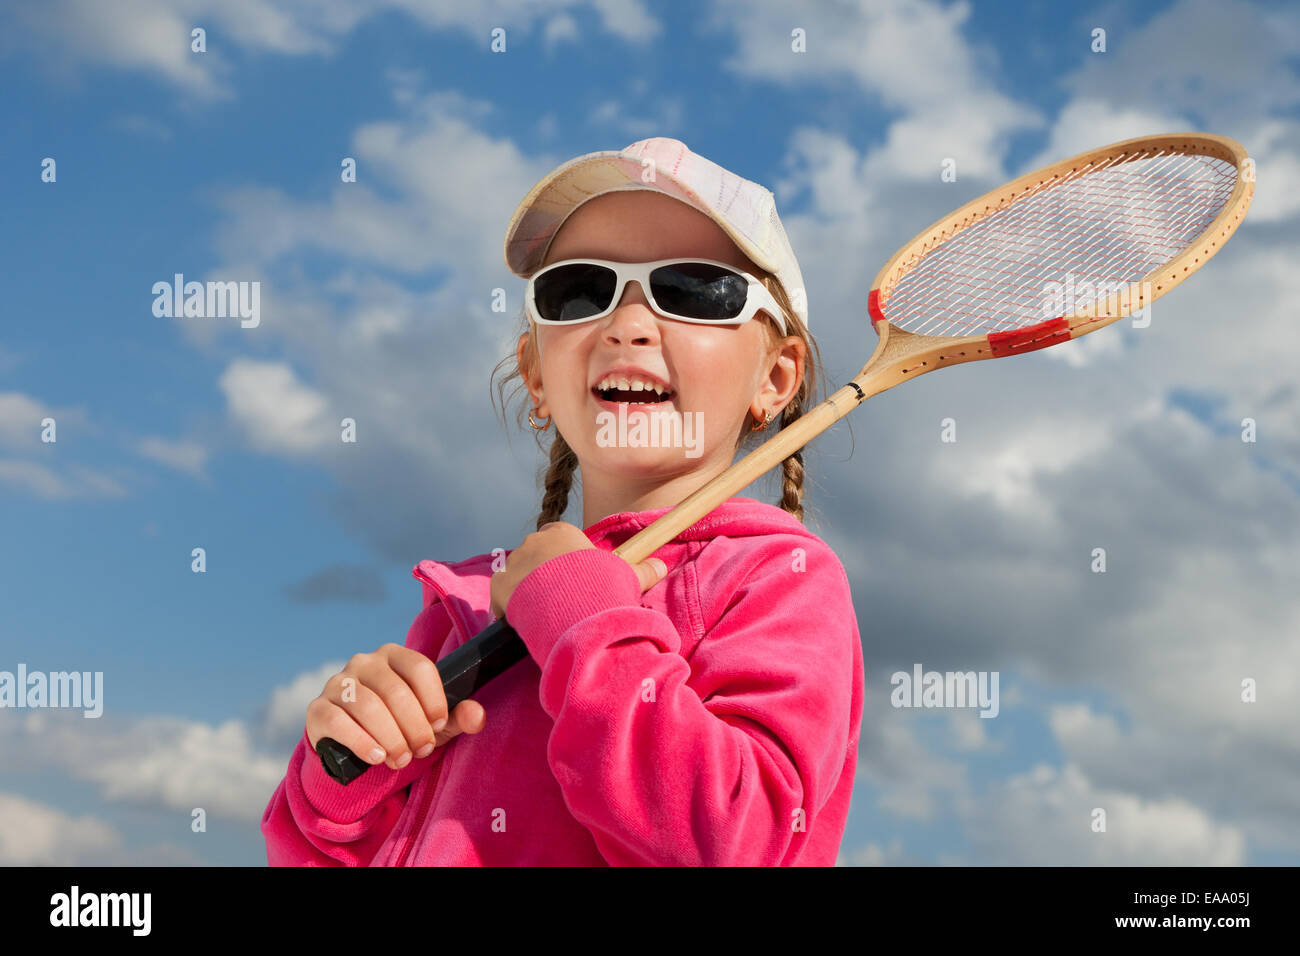 little girl with racket for badminton Stock Photo